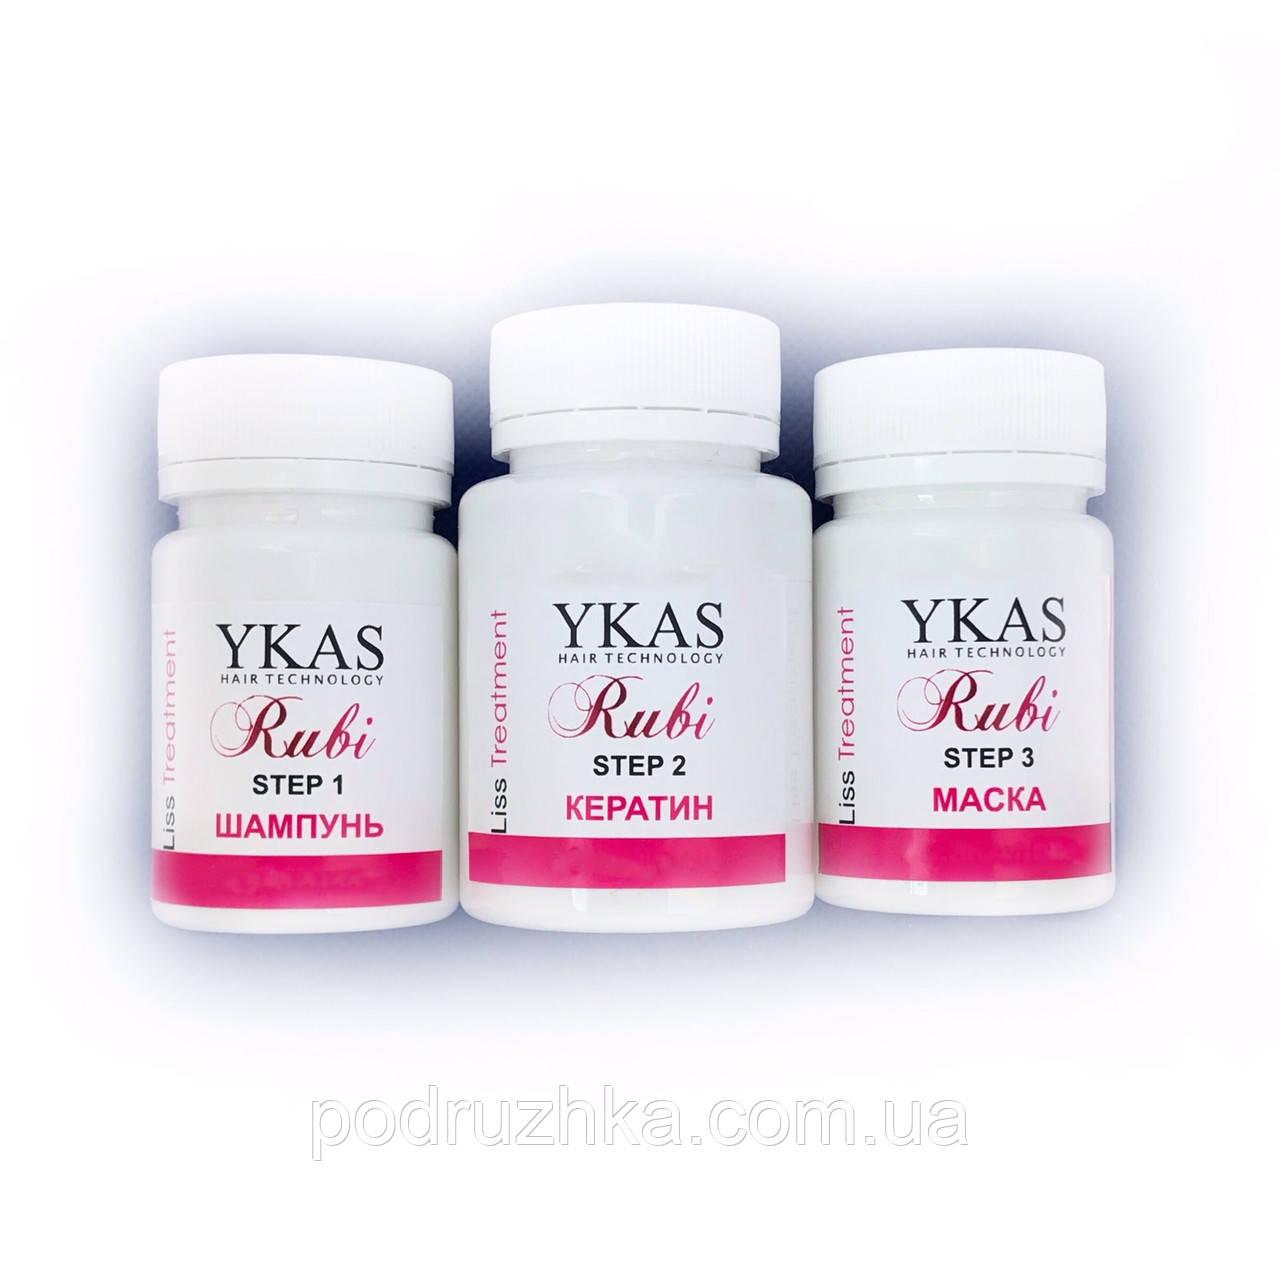 YKAS Rubi Набор кератина для волос 100/200/100 г (разлив)